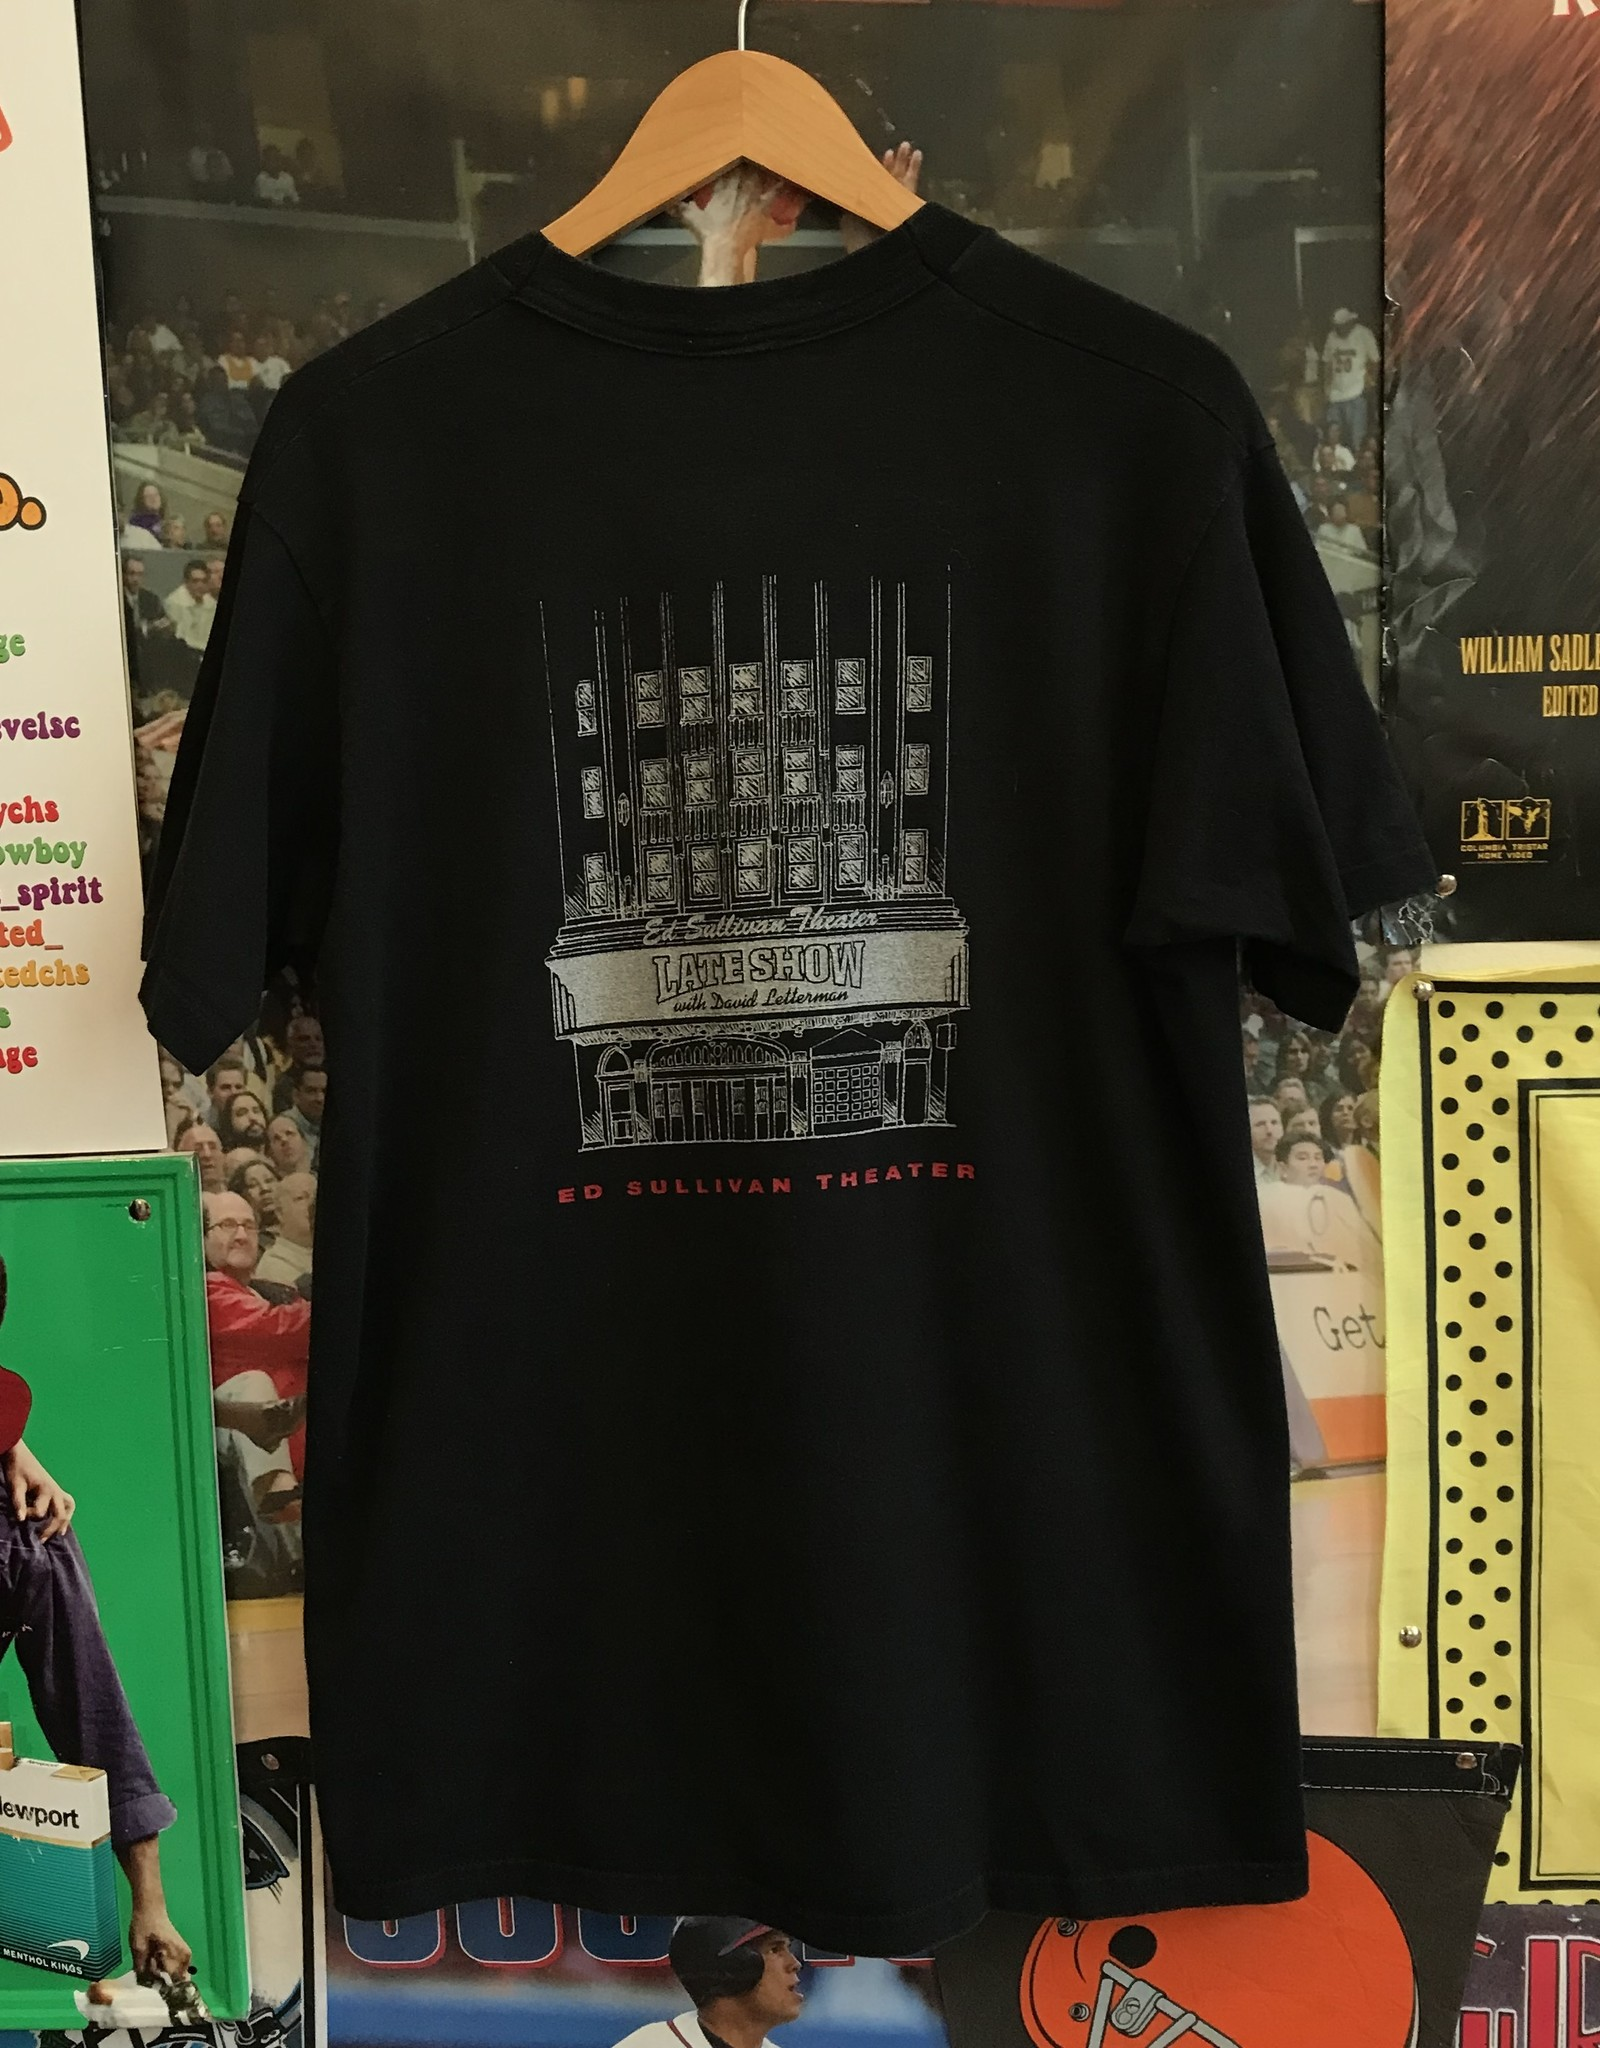 3996ted sullivan theater tee black sz L